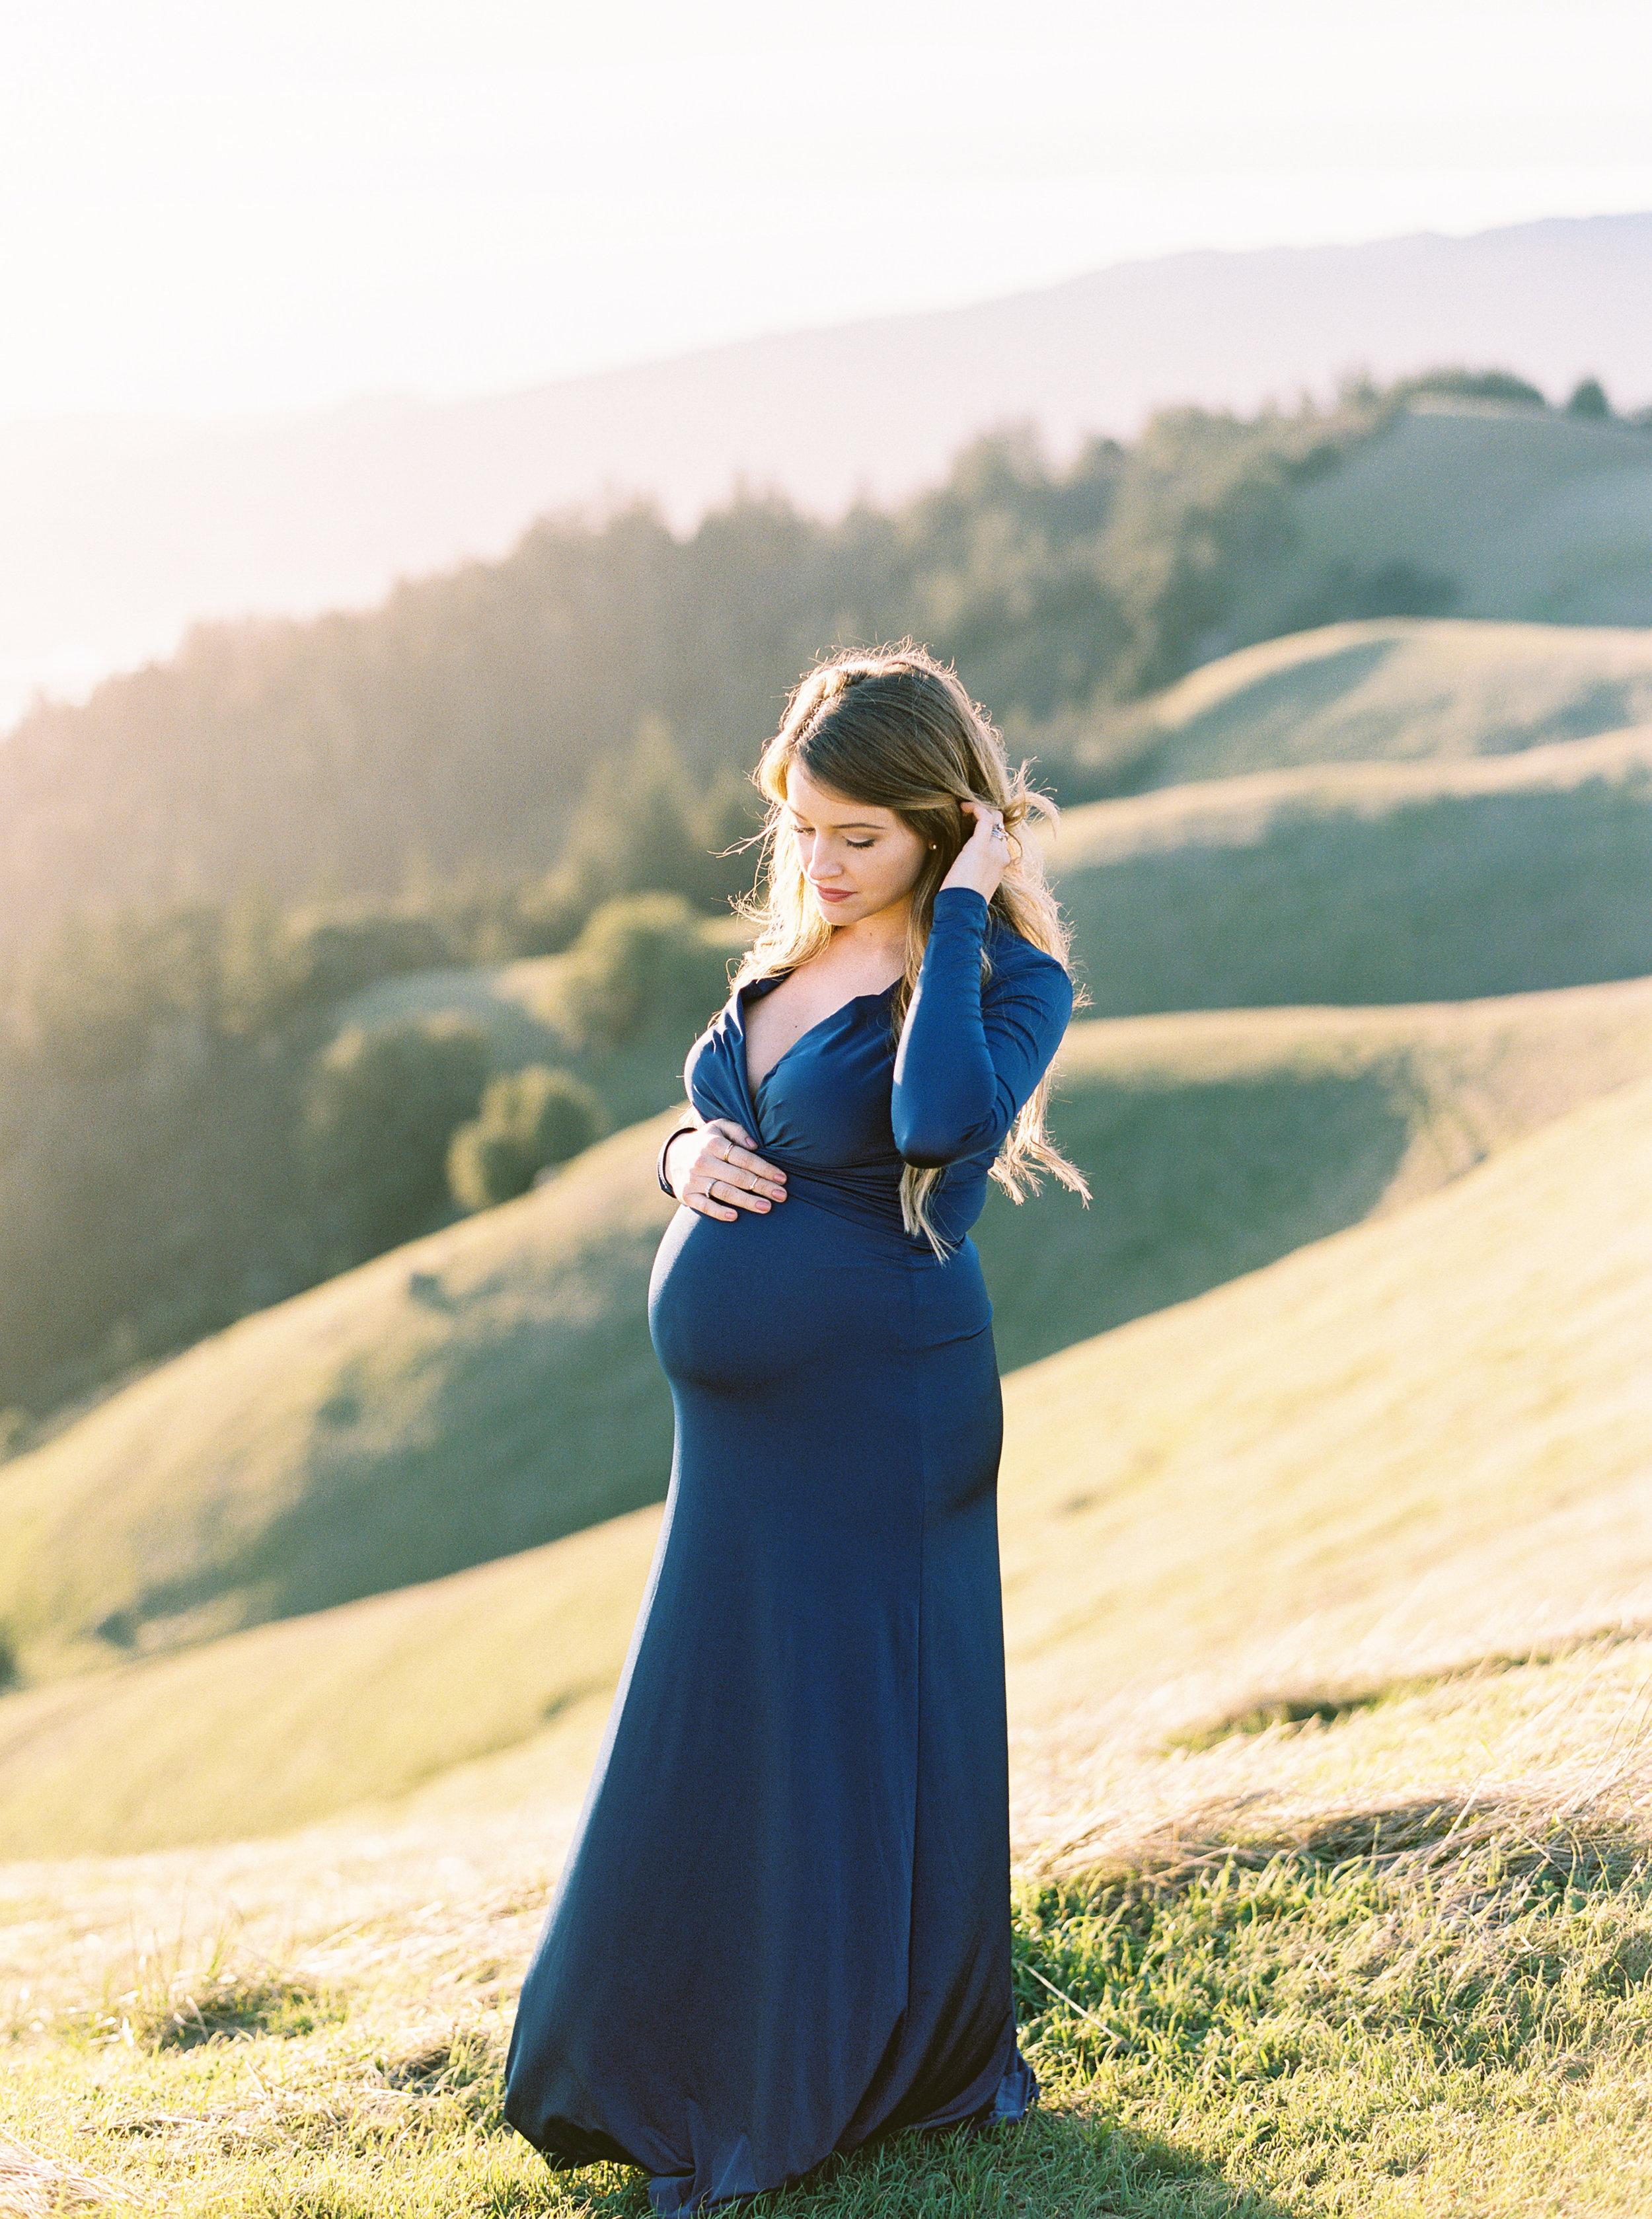 mount-tamalpais-san-francisco-maternity-photography-106.jpg